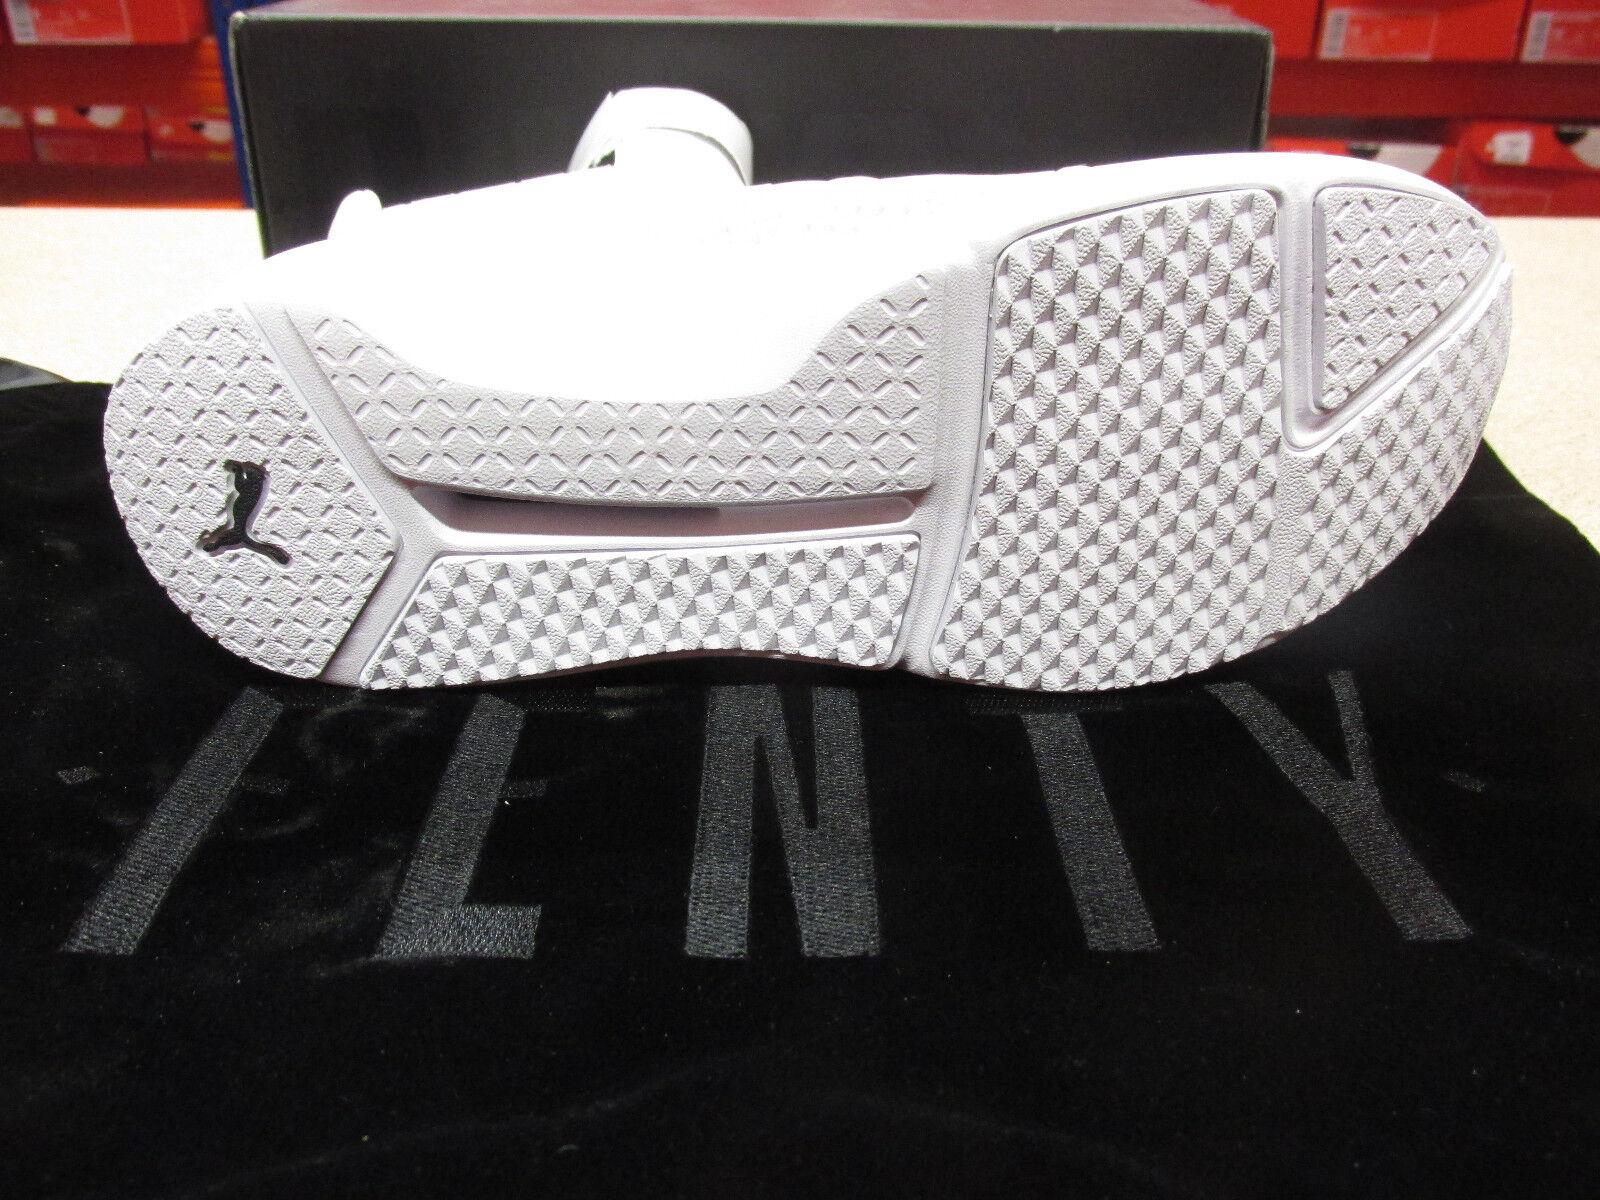 Puma Fenty Trainer Damenschuhe Hi Top Top Top Trainers 189193 02 Sneakers Schuhes 4db262